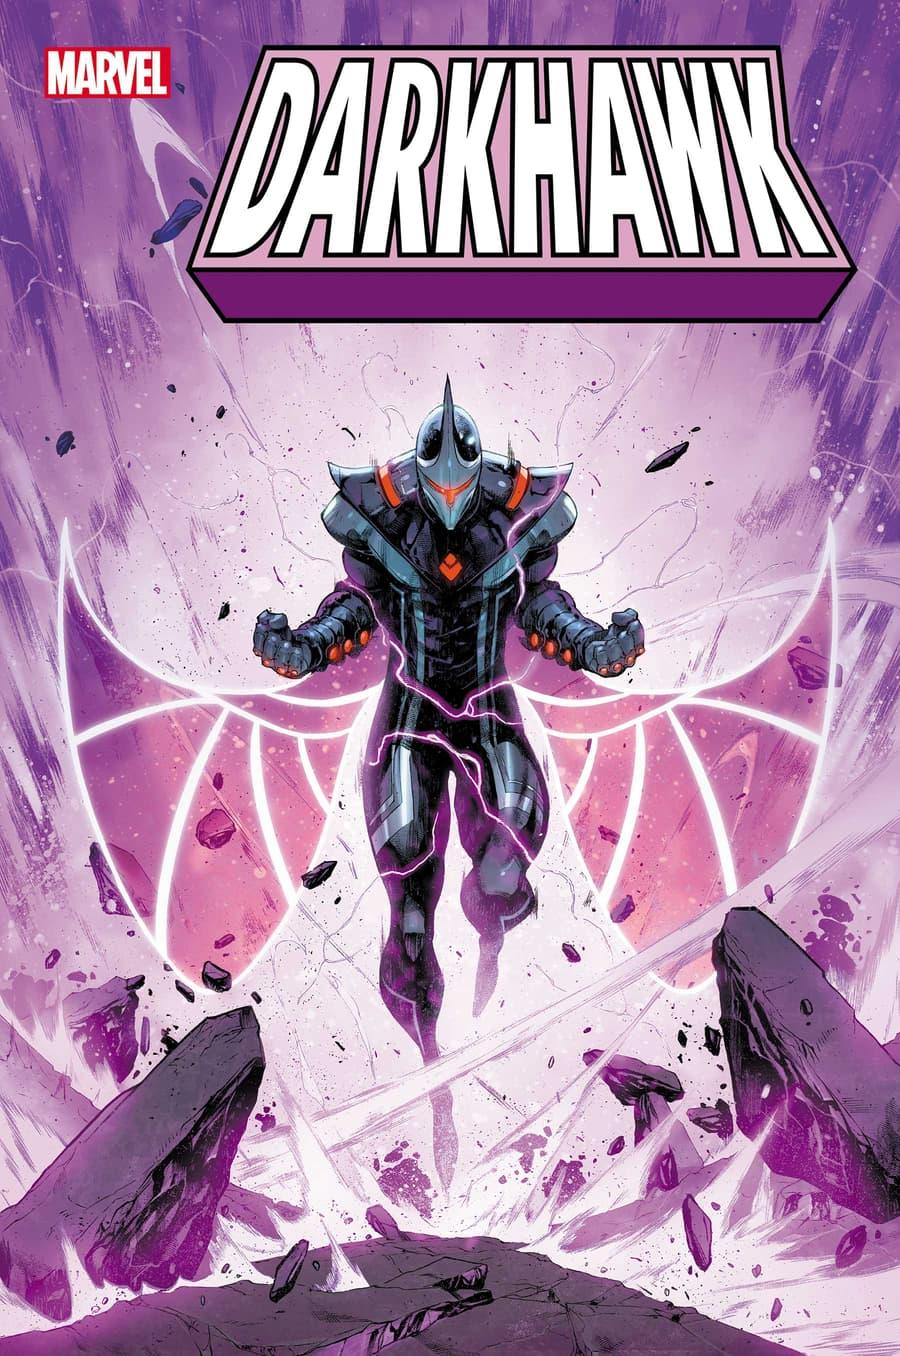 DARKHAWK #1 cover by Iban Coello